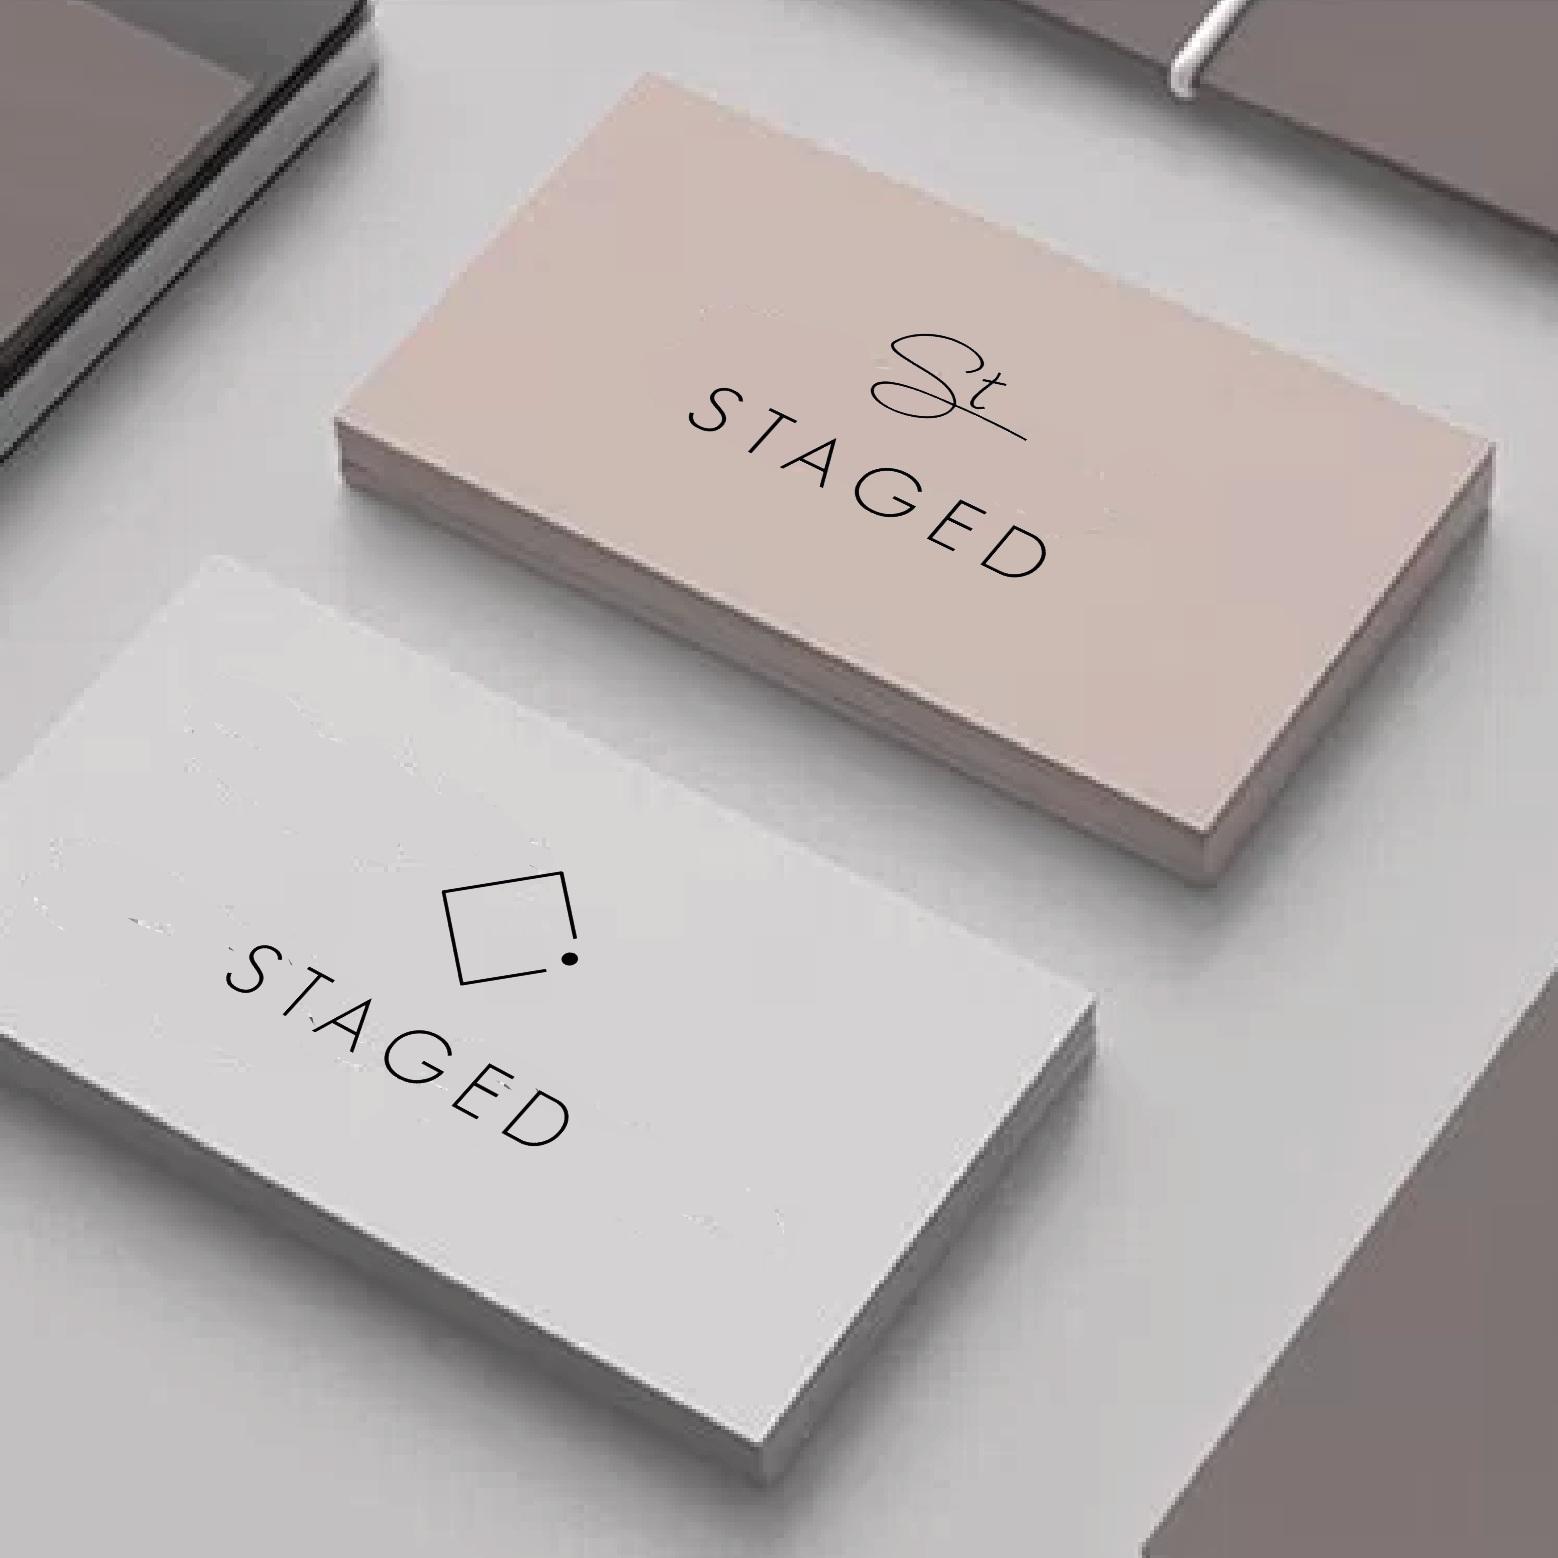 Staged+stationary_Tekengebied+1.jpg